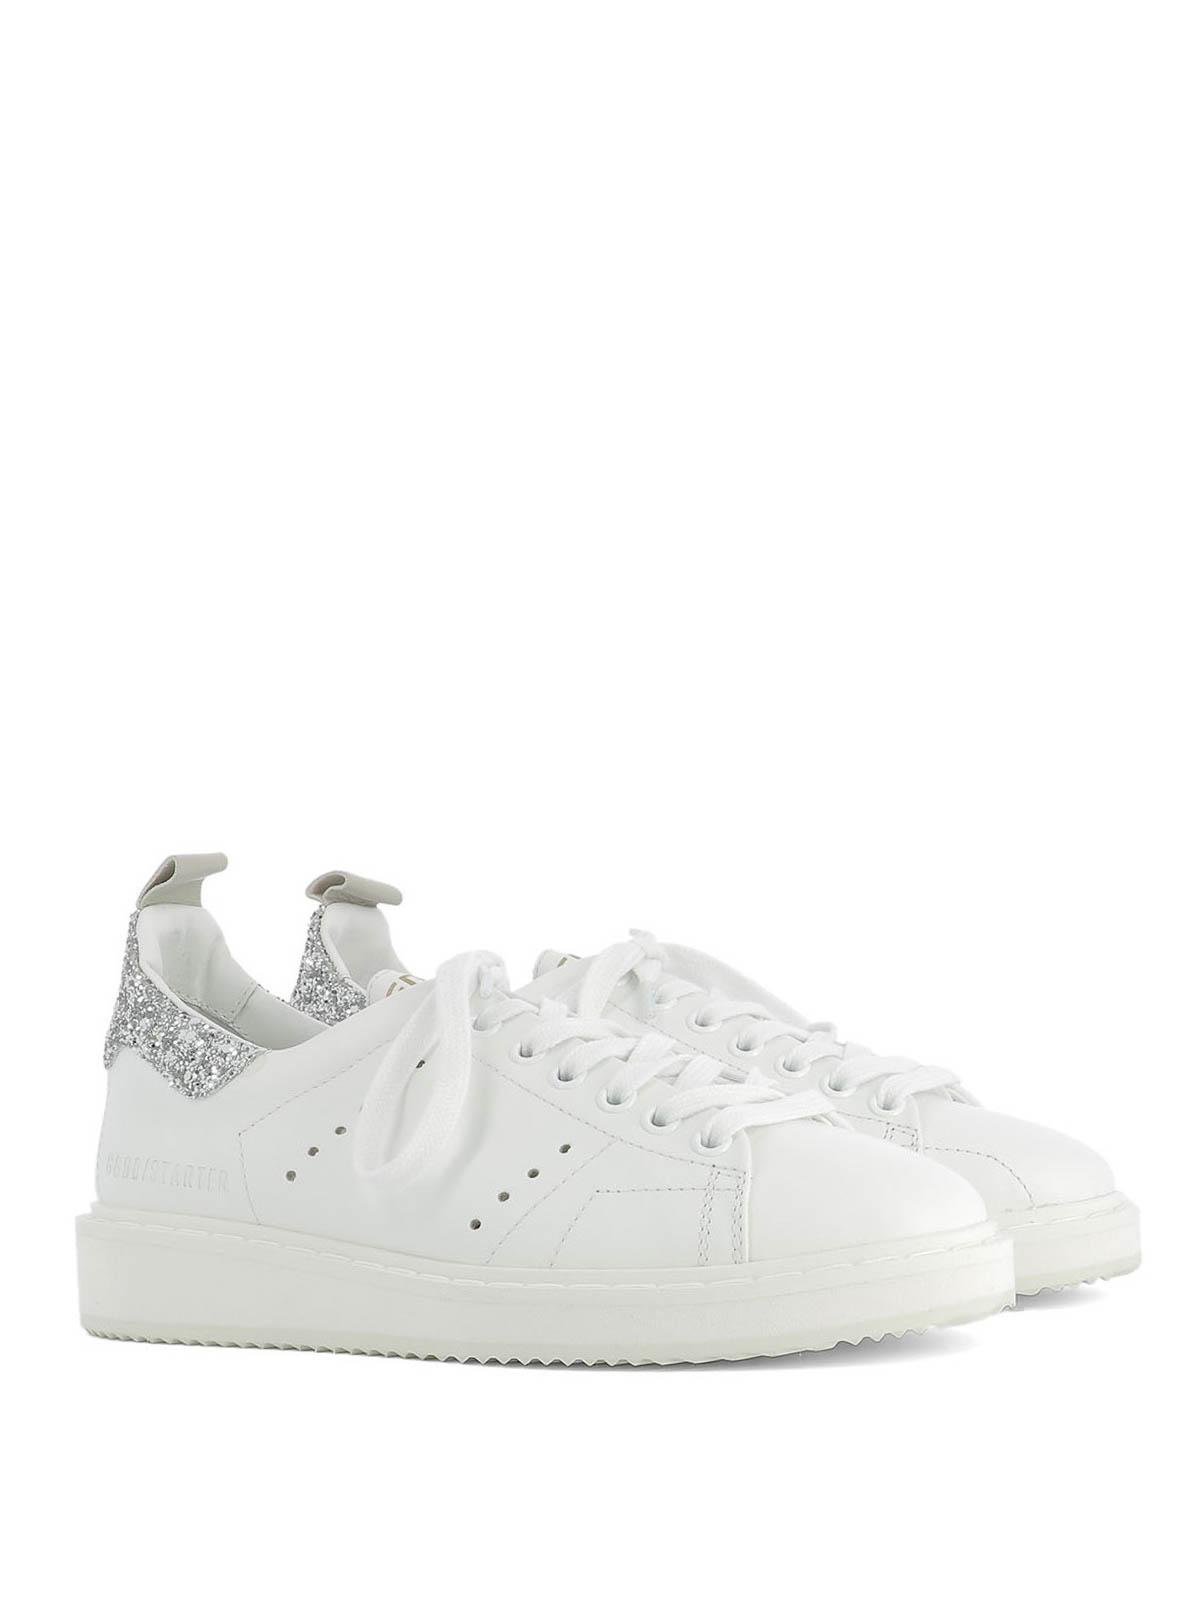 ebac05f9ed820 Golden Goose - Starter glitter back sneakers - trainers - G30WS631 D6